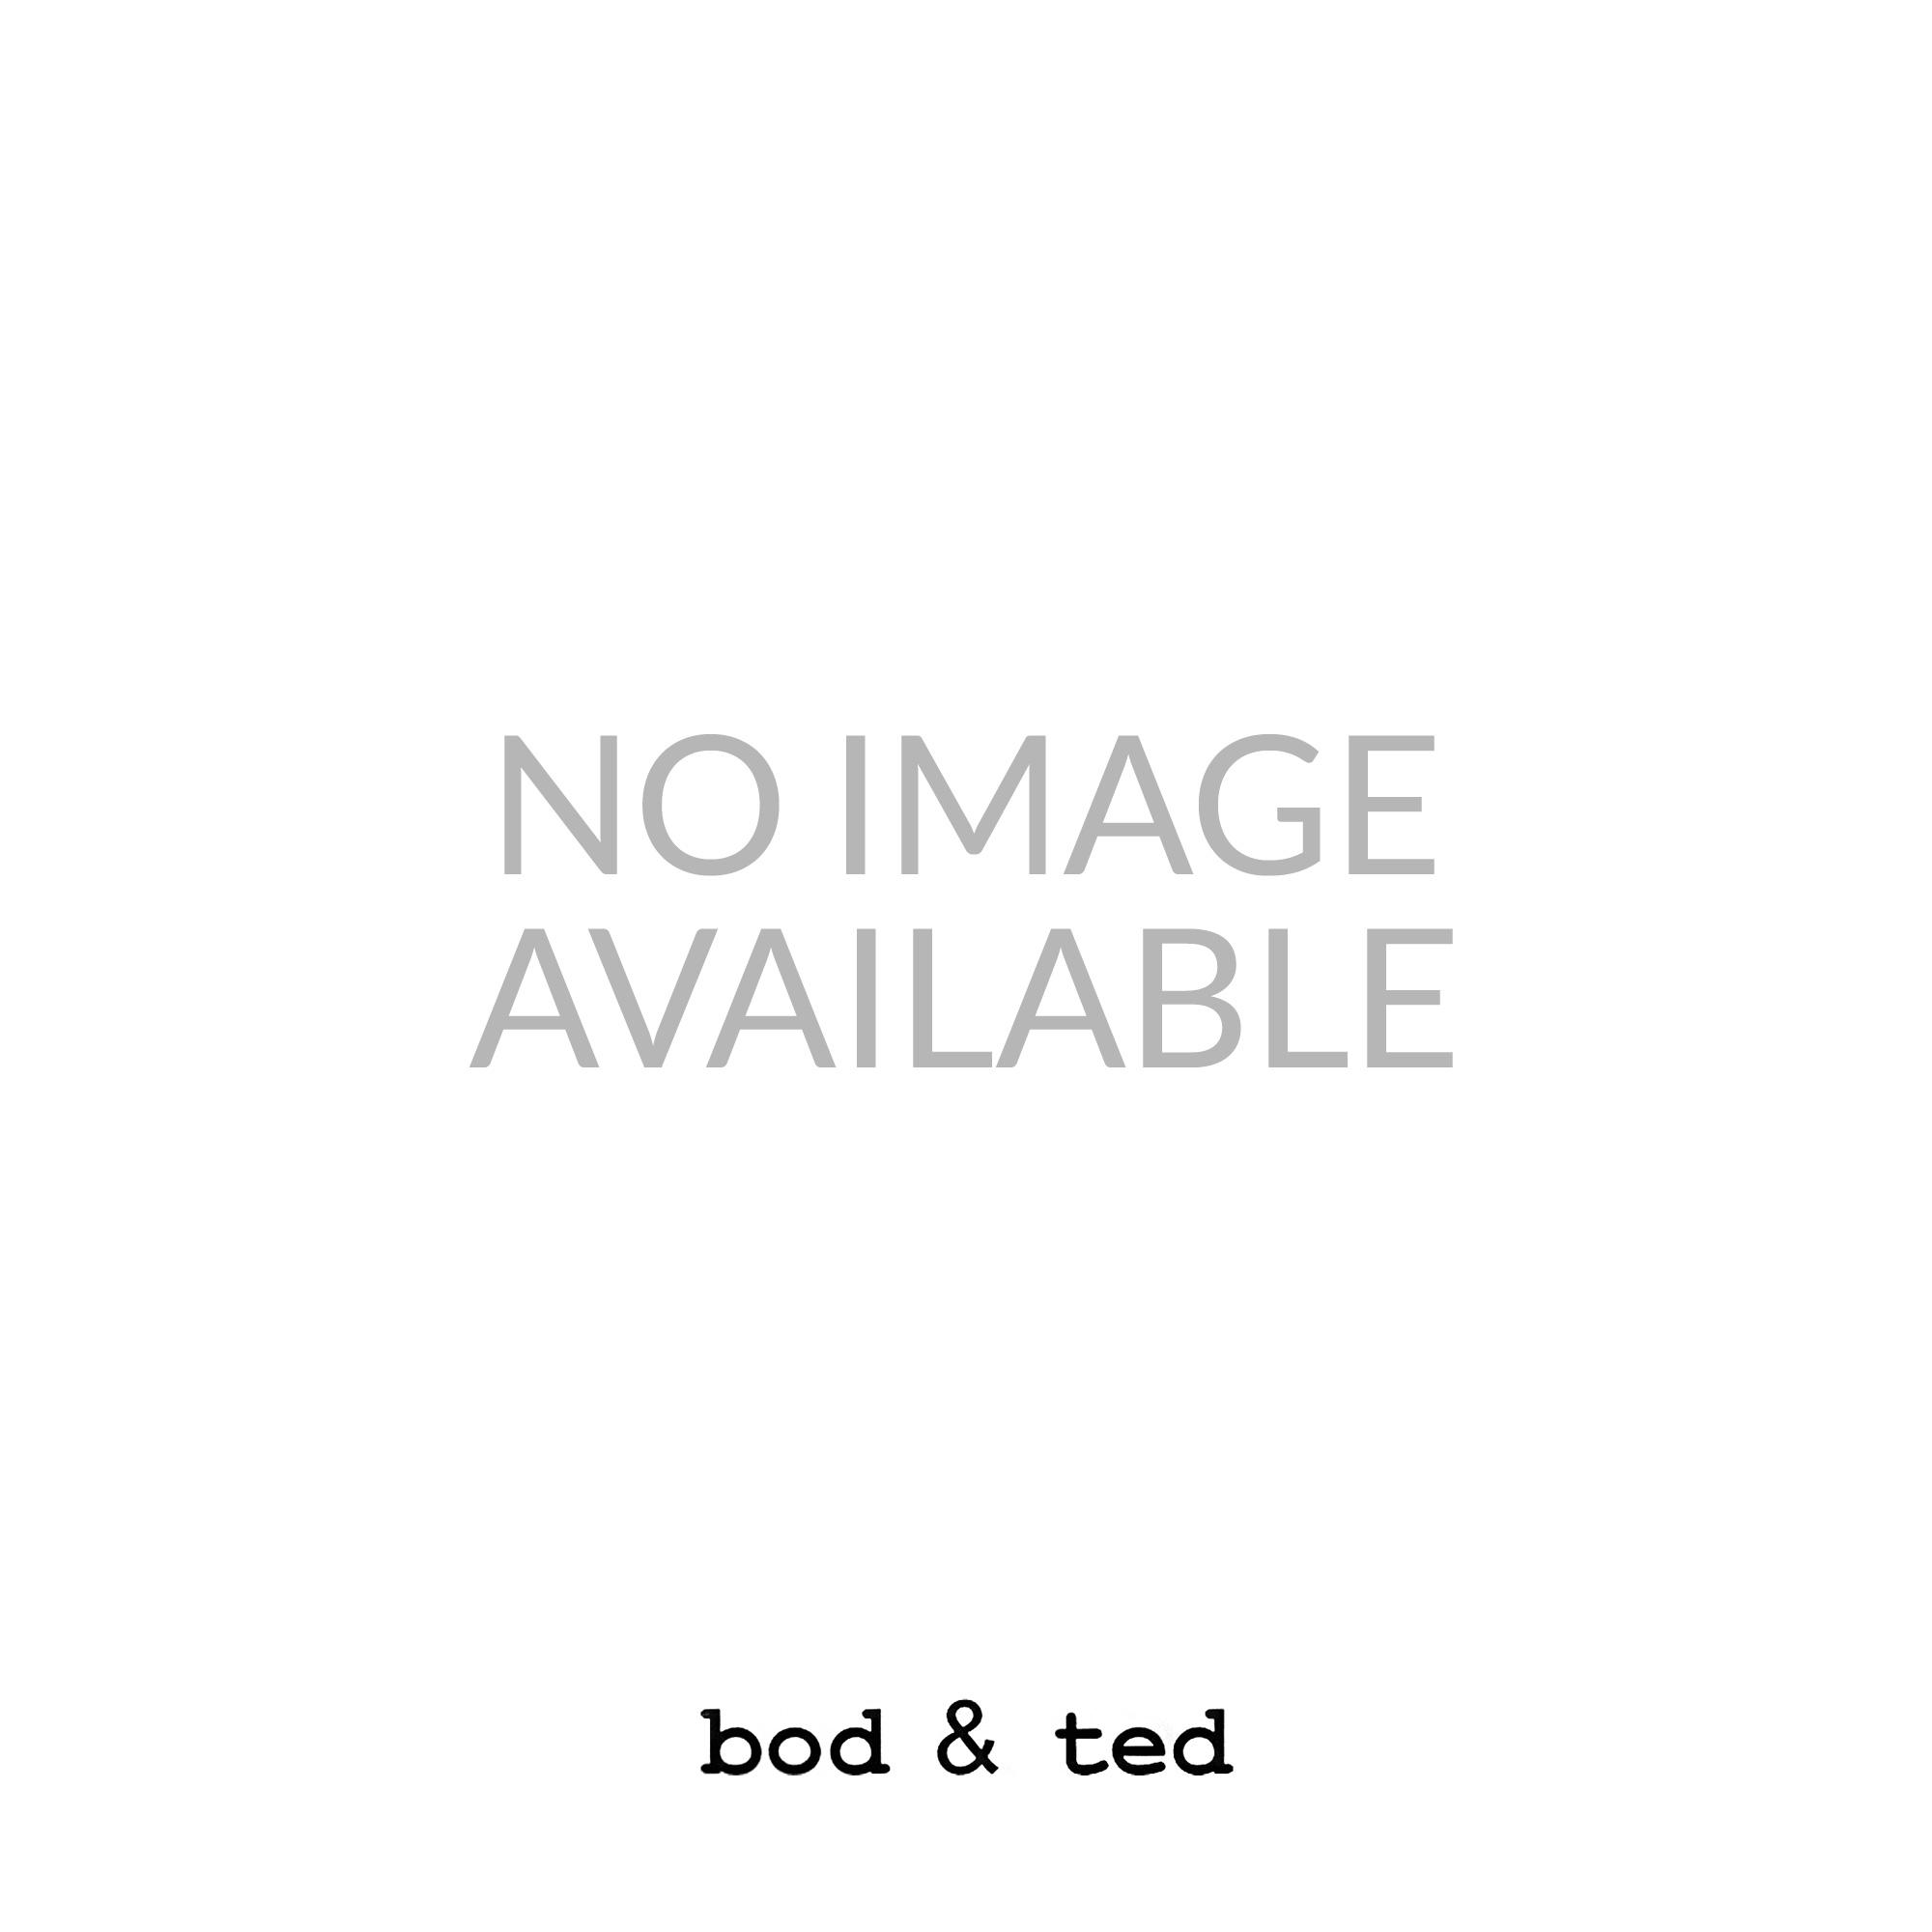 Skandinavisk Hygge (Cosiness) Candle